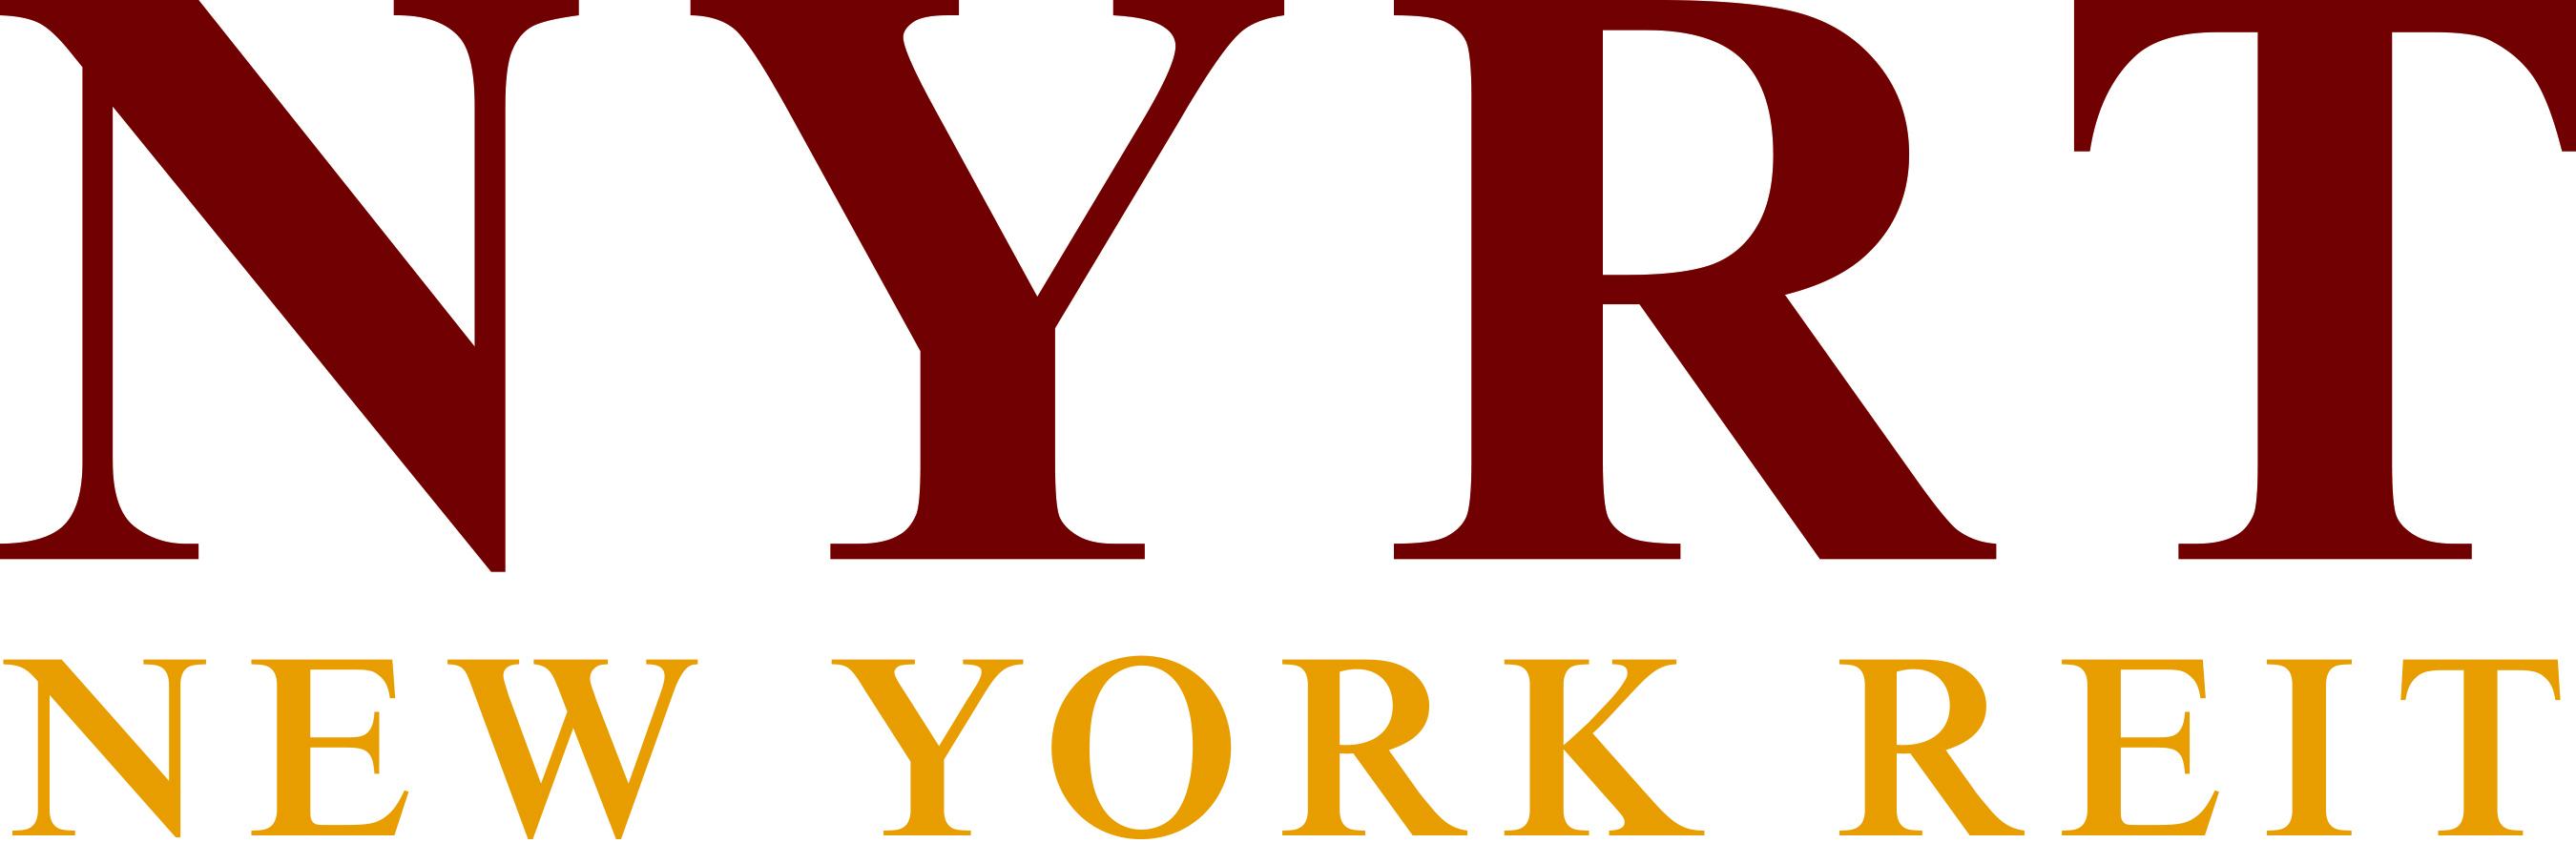 NYRT Logo (PRNewsFoto/New York REIT, Inc.) (PRNewsFoto/New York REIT, Inc.)